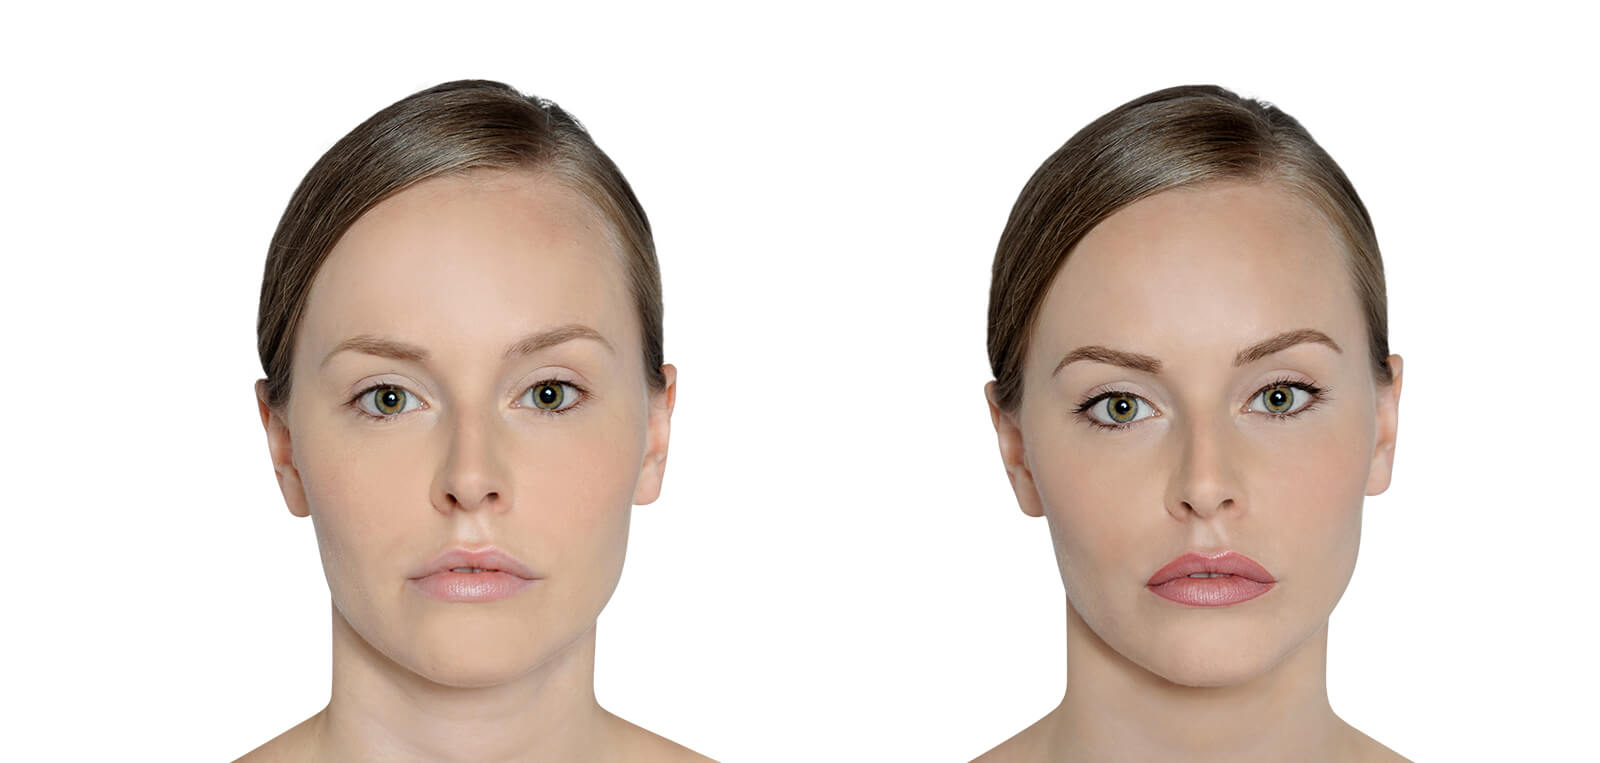 Permanent Make-Up vorher/nachher komplett Damen 04 | Der Jungbrunnen Aichach